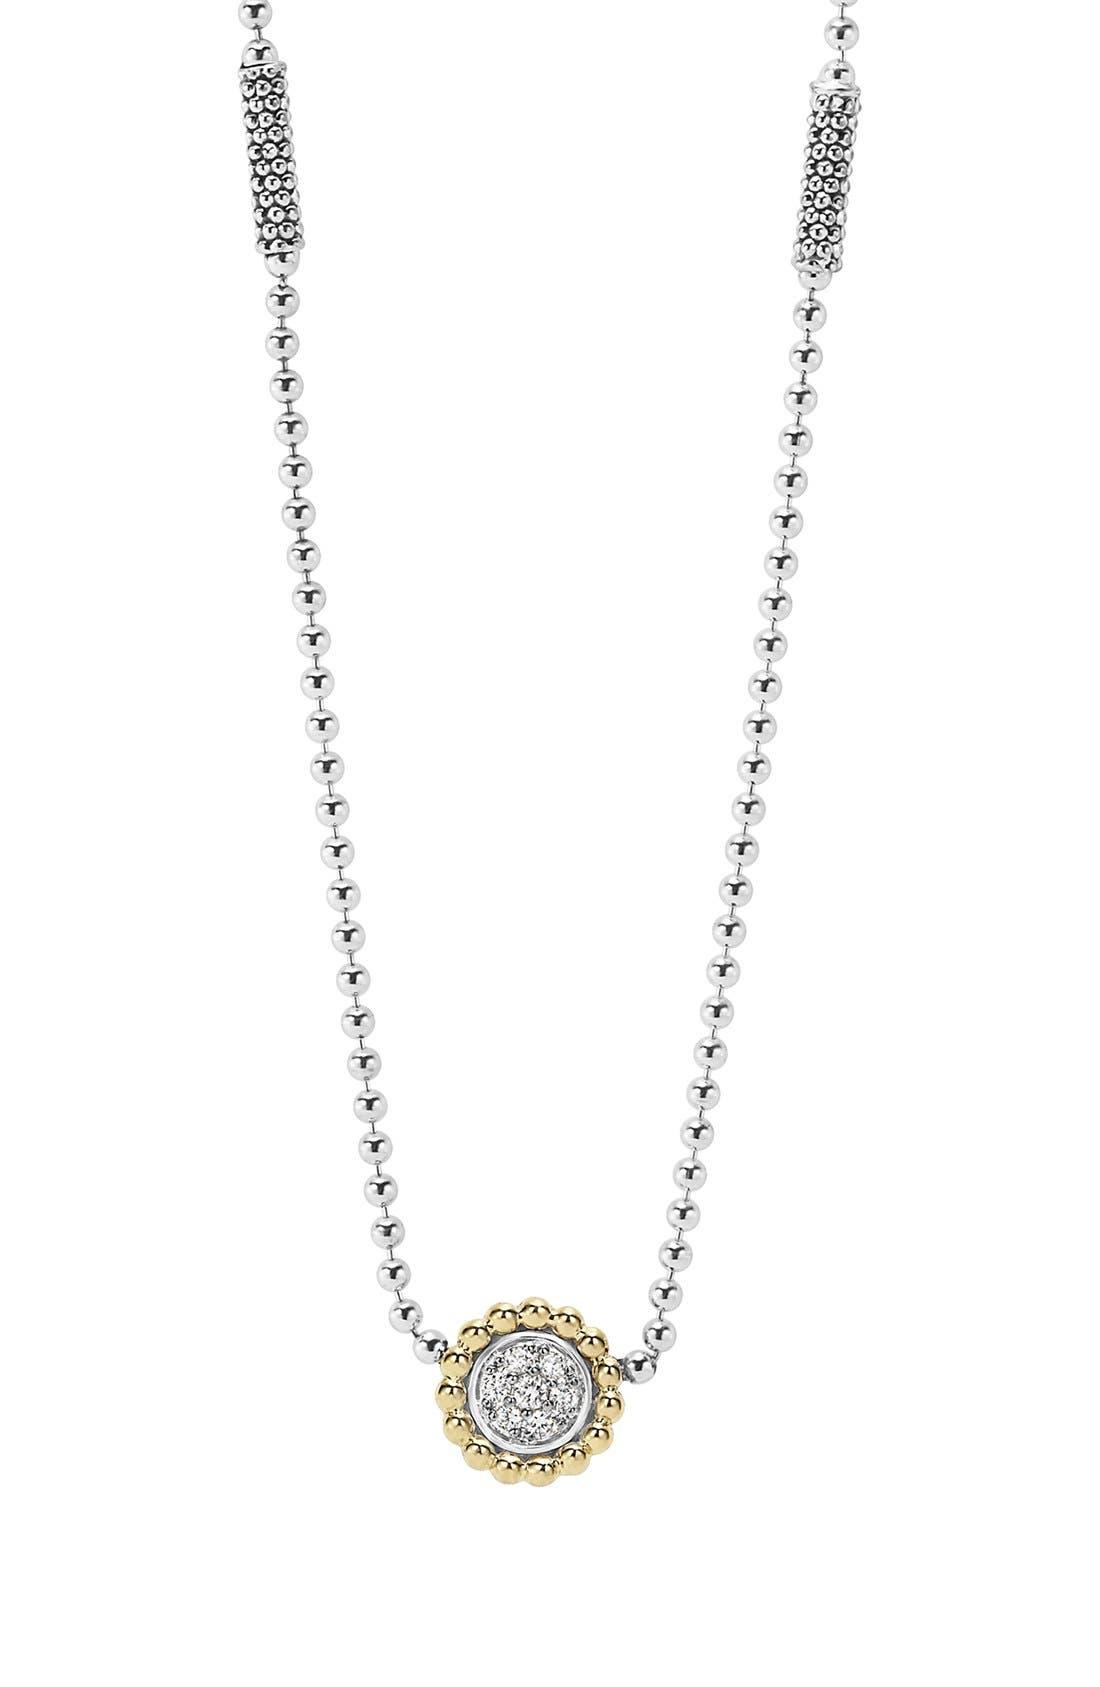 LAGOS 'Caviar' Circle Pendant Necklace